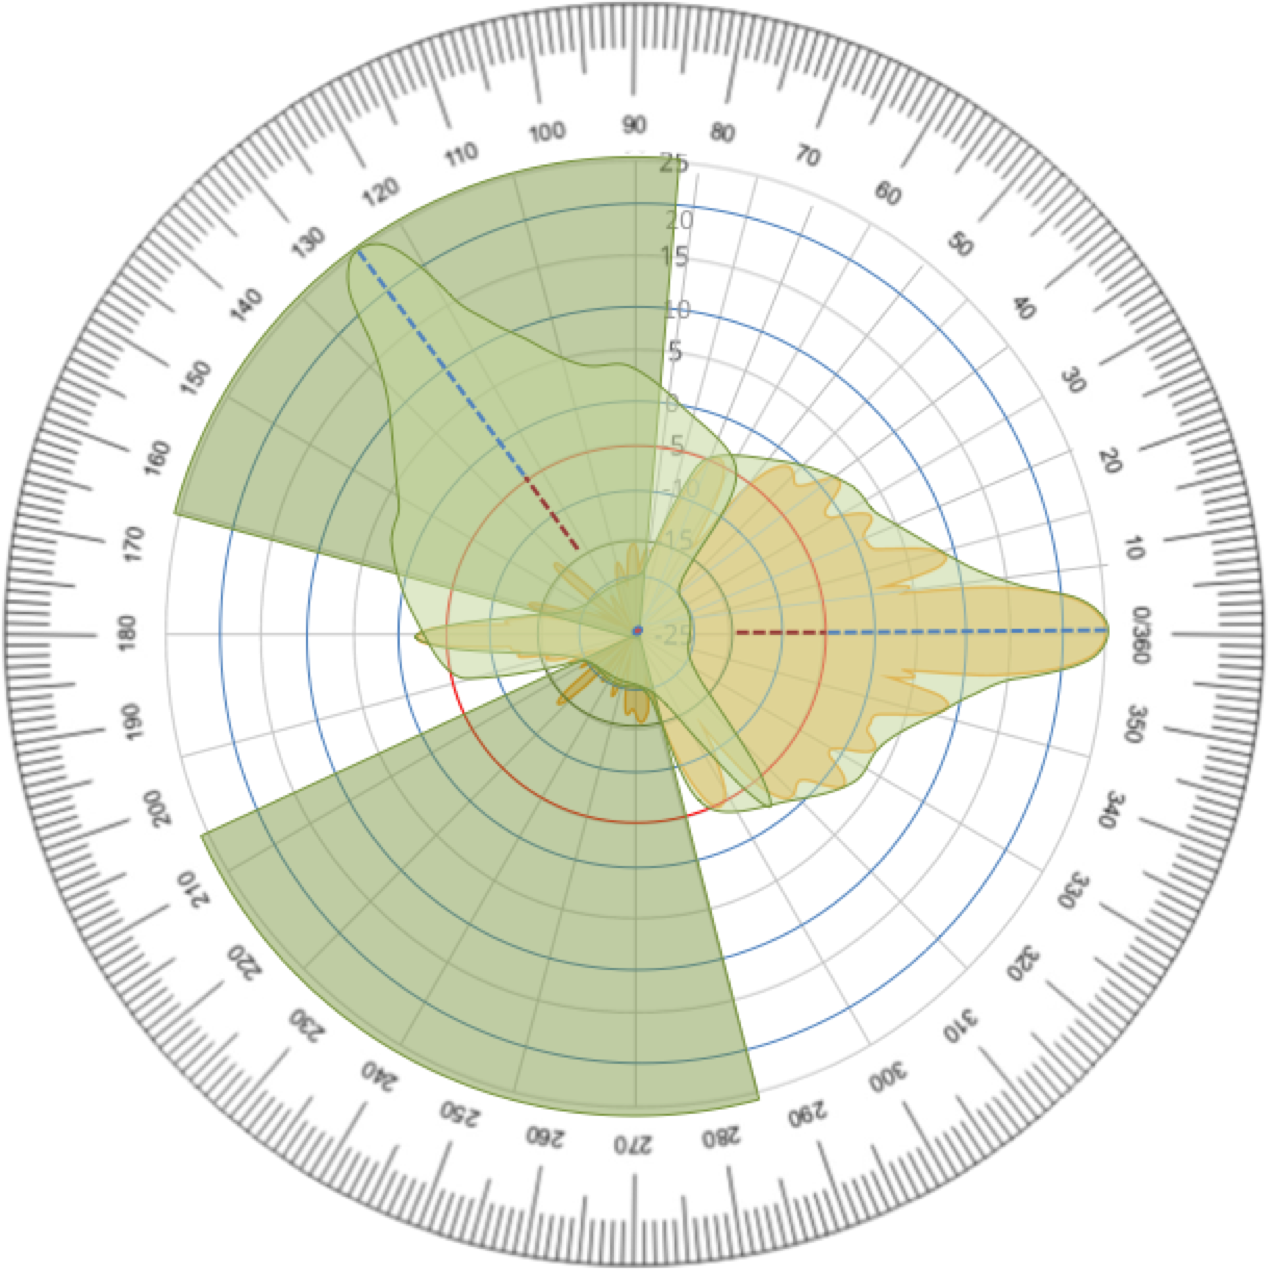 tdma-whitepaper-Figure-14.png